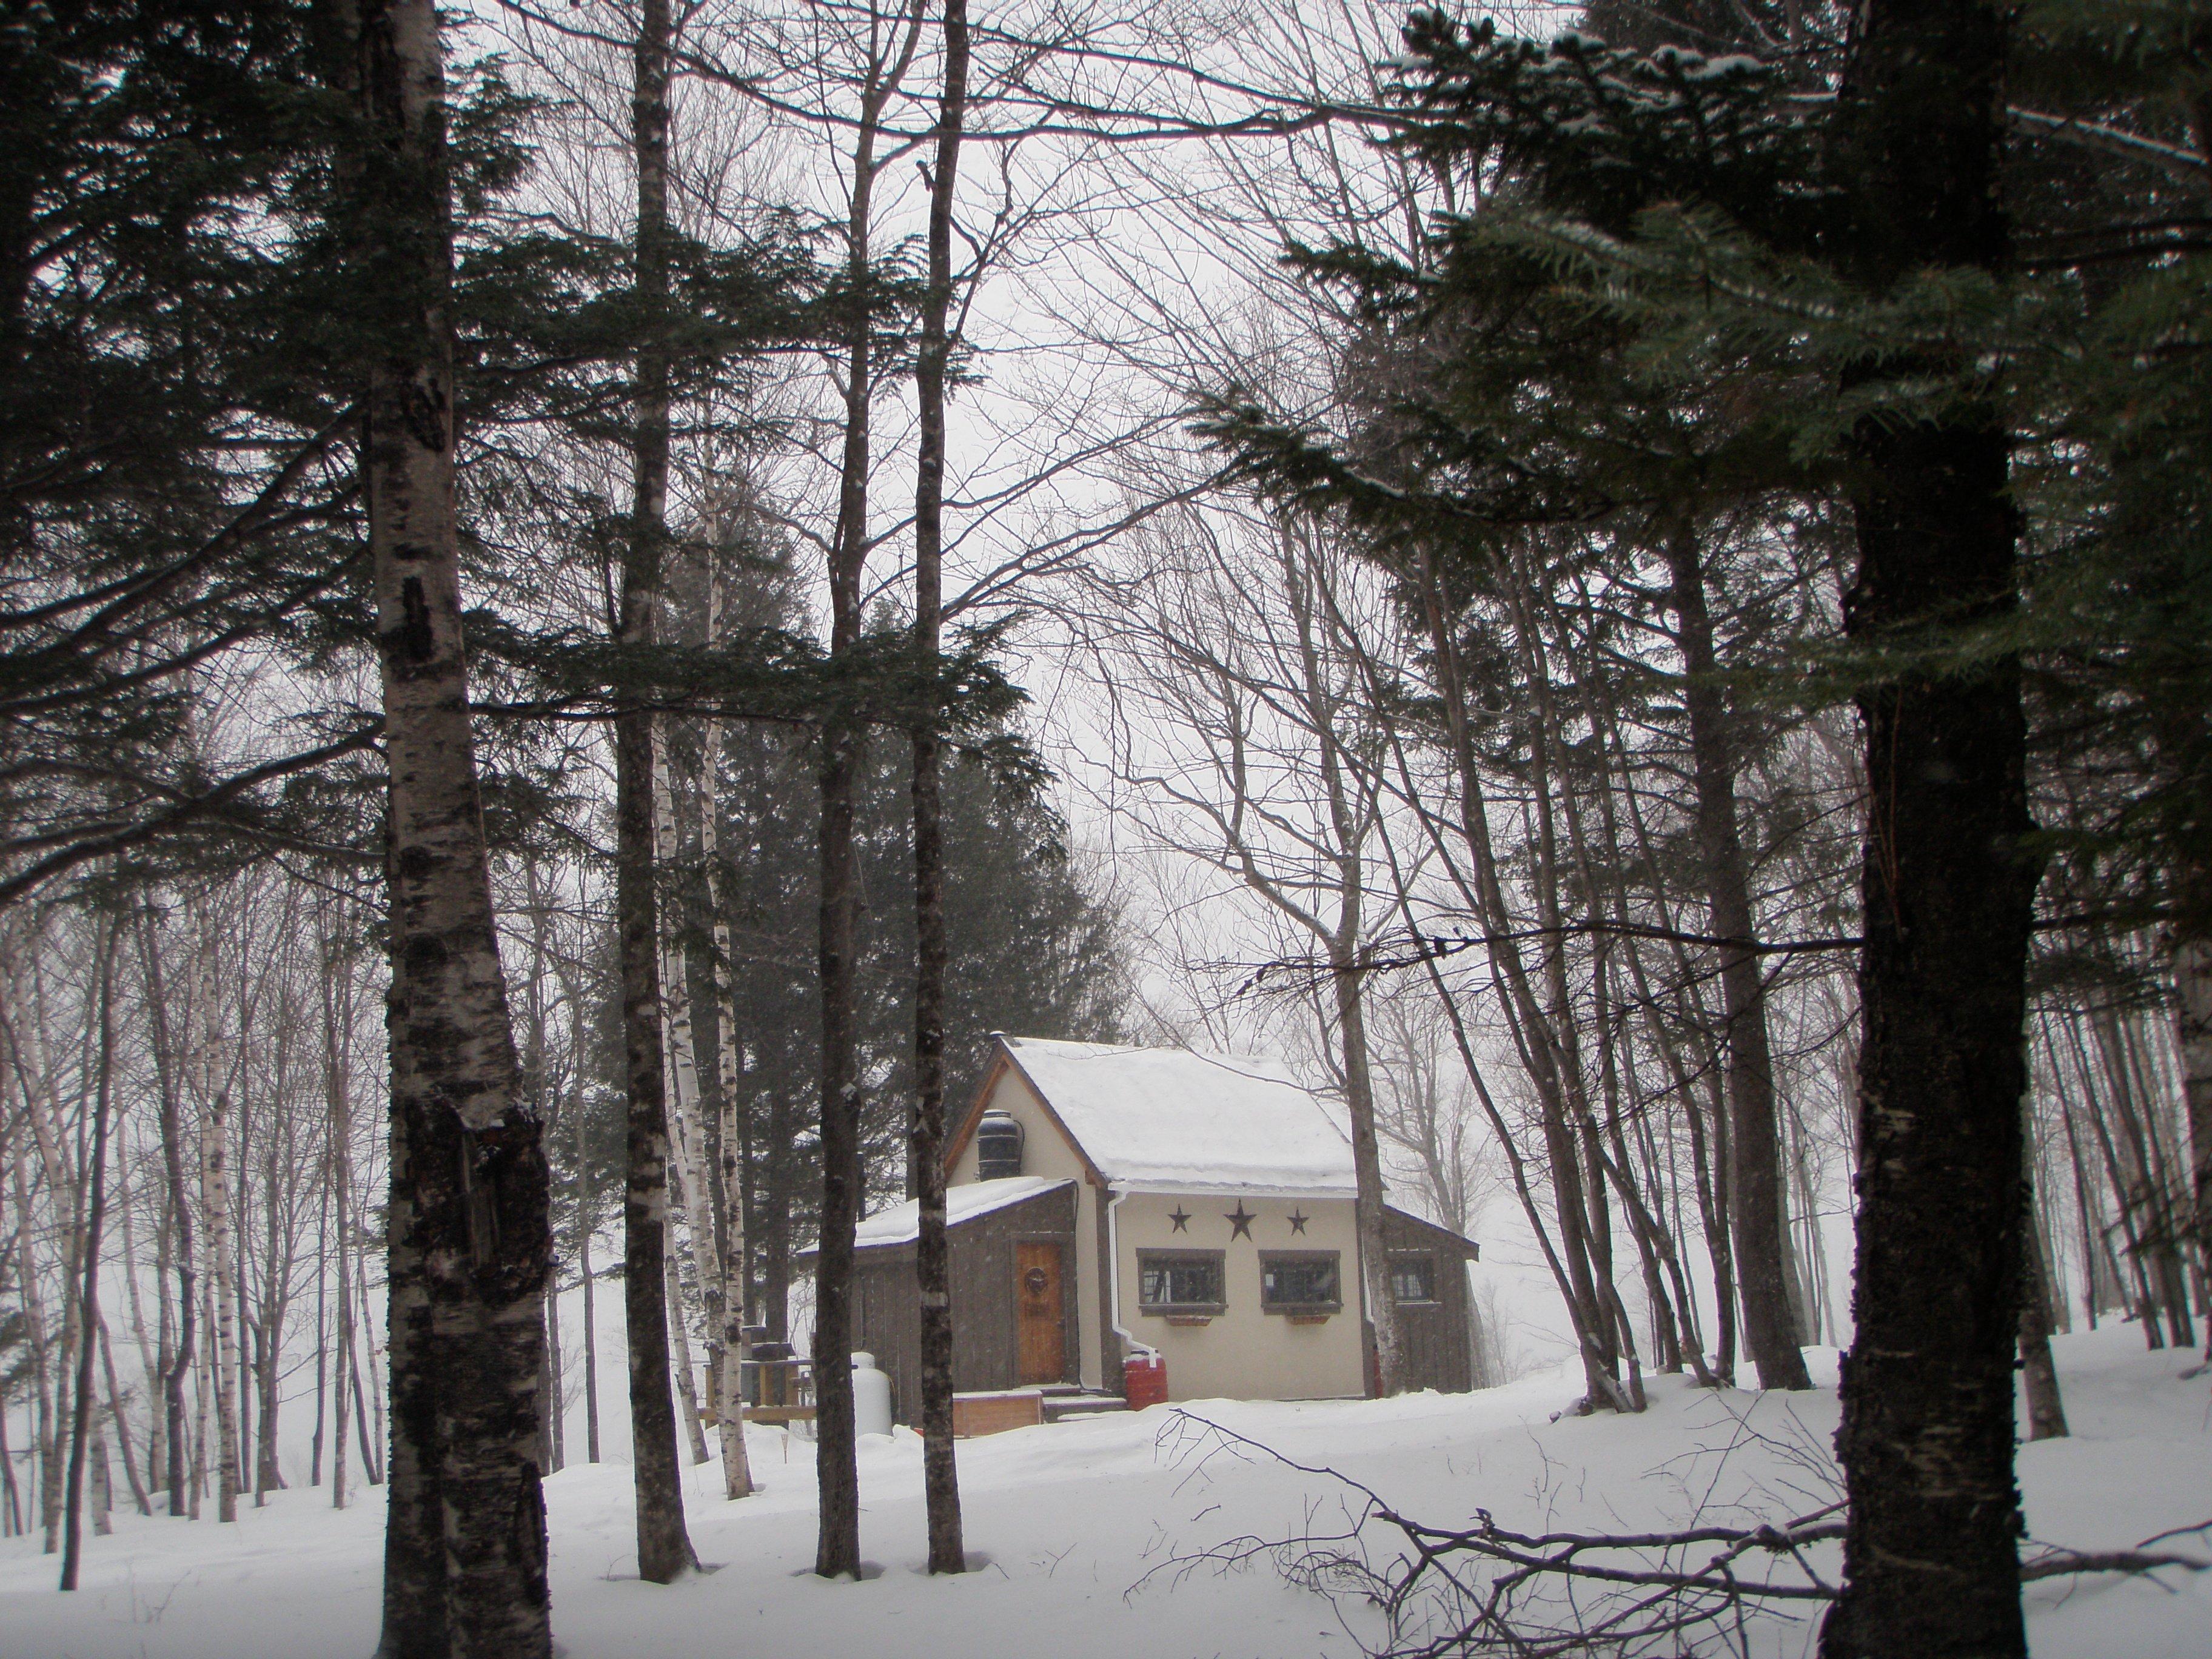 Among the tall hemlocks and birch